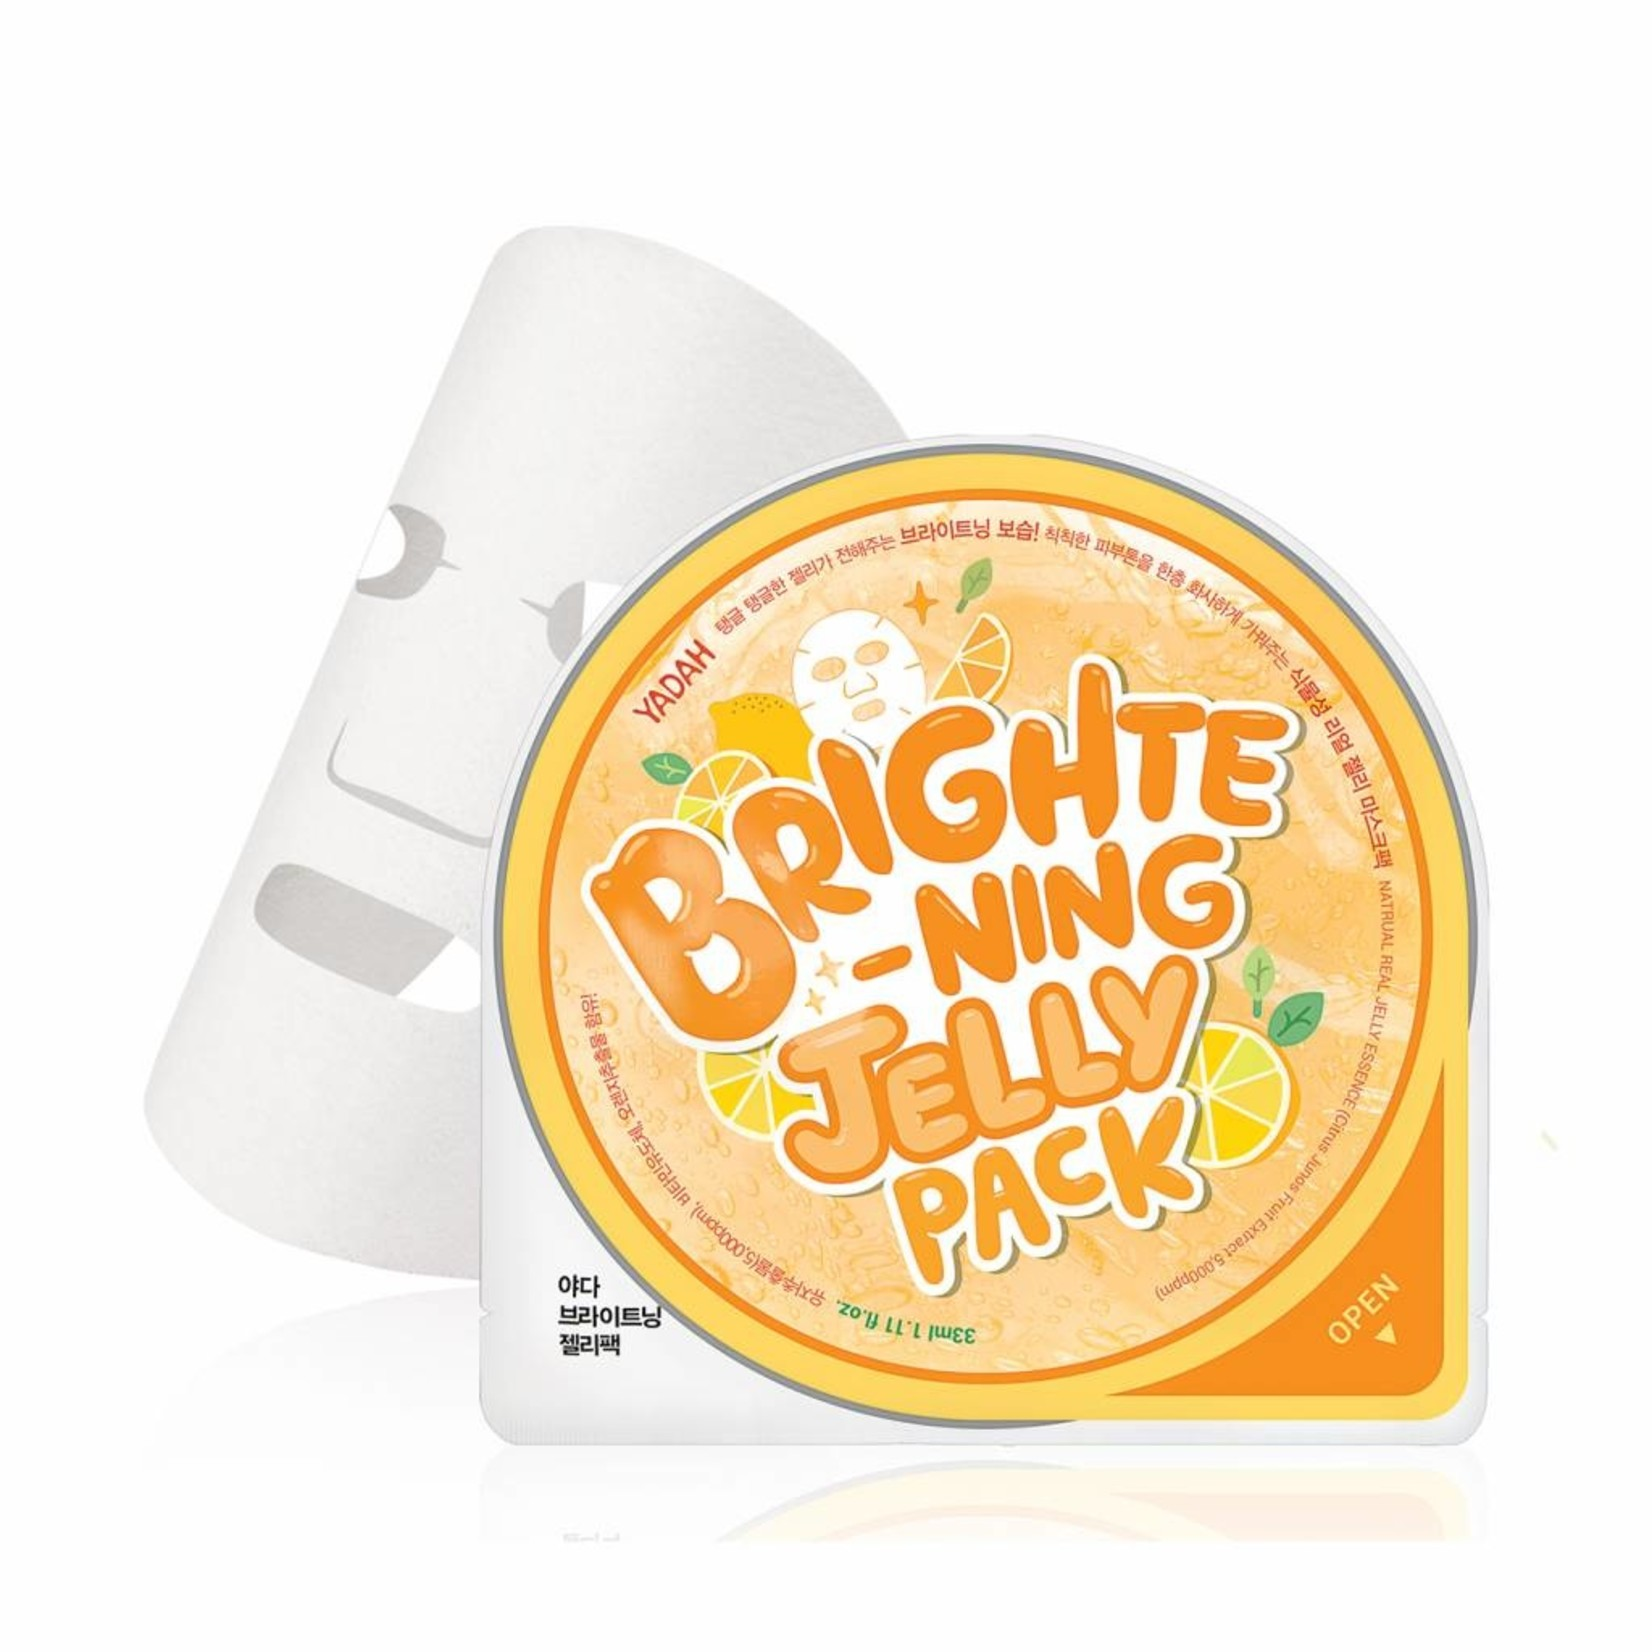 Yadah Brightening Jelly Pack 5 pcs